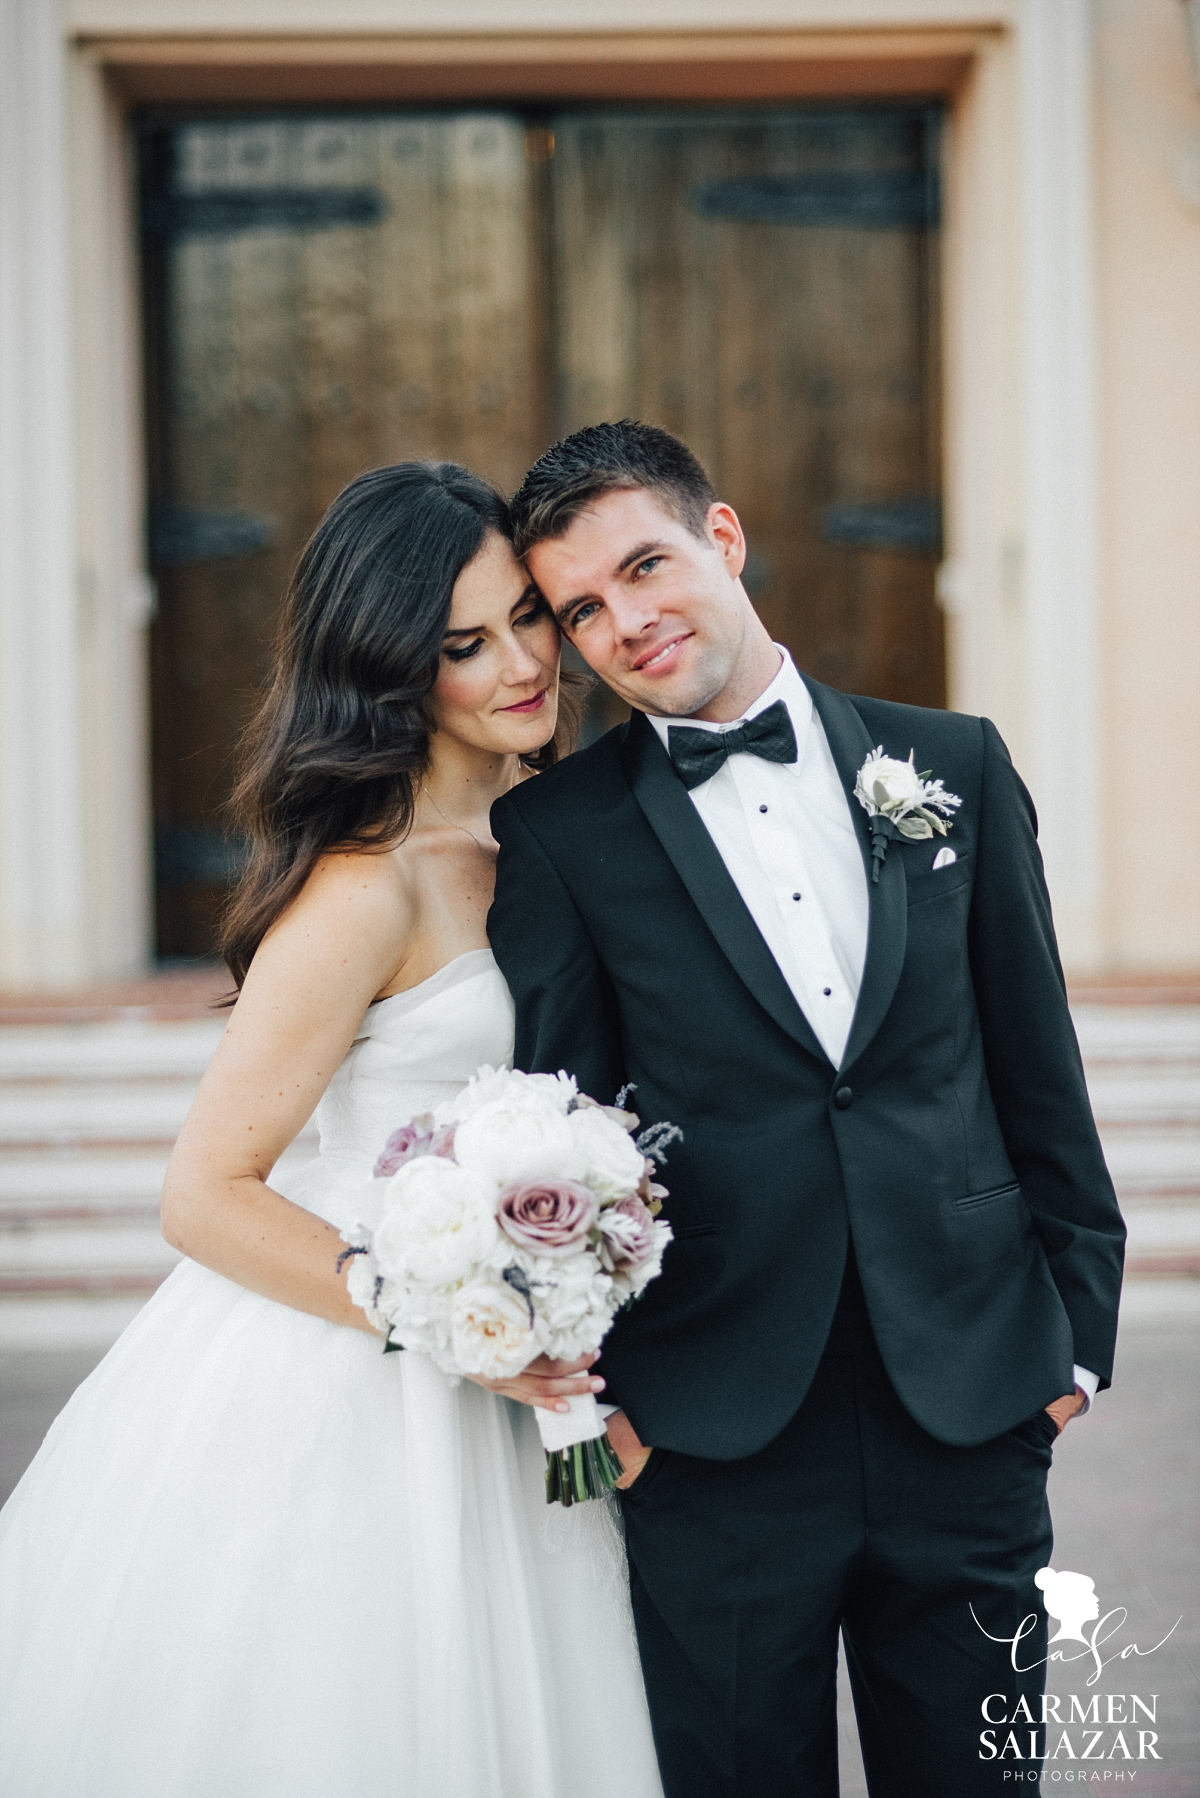 Bride and groom at Santa Clara wedding - Carmen Salazar